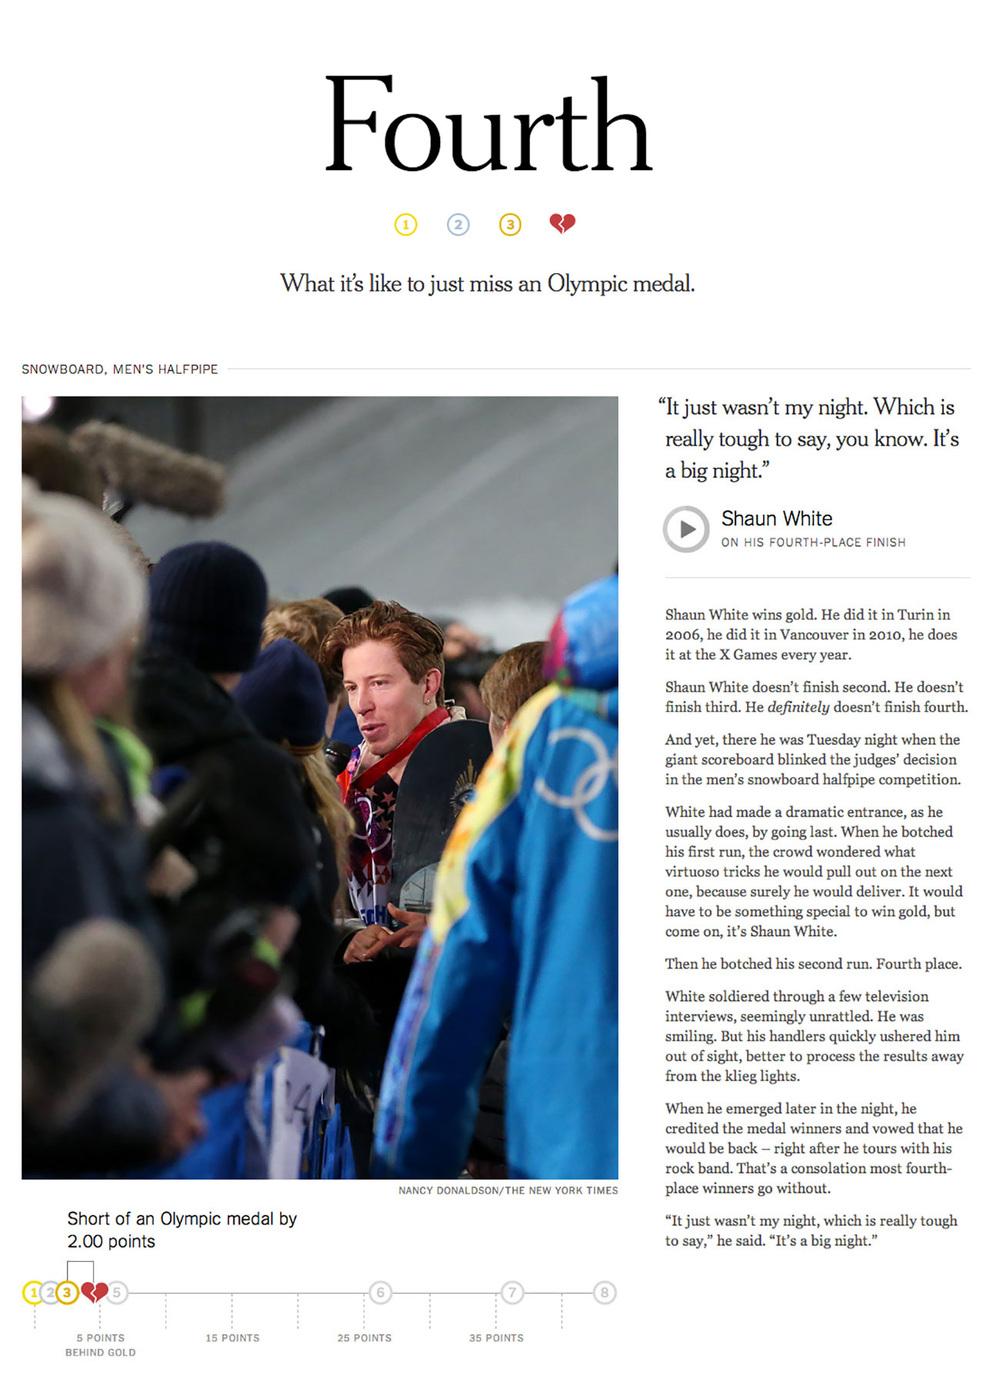 Fourth, The New York Times    Produced by Ken Belson, Sam Borden, John Branch, Shan Carter, Jennifer Daniel, Sam Dolnick, Nancy Donaldson, Josh Keller, Jim Luttrell, Mary Pilon, Justin Sablich, David Segal, and Joe Ward.